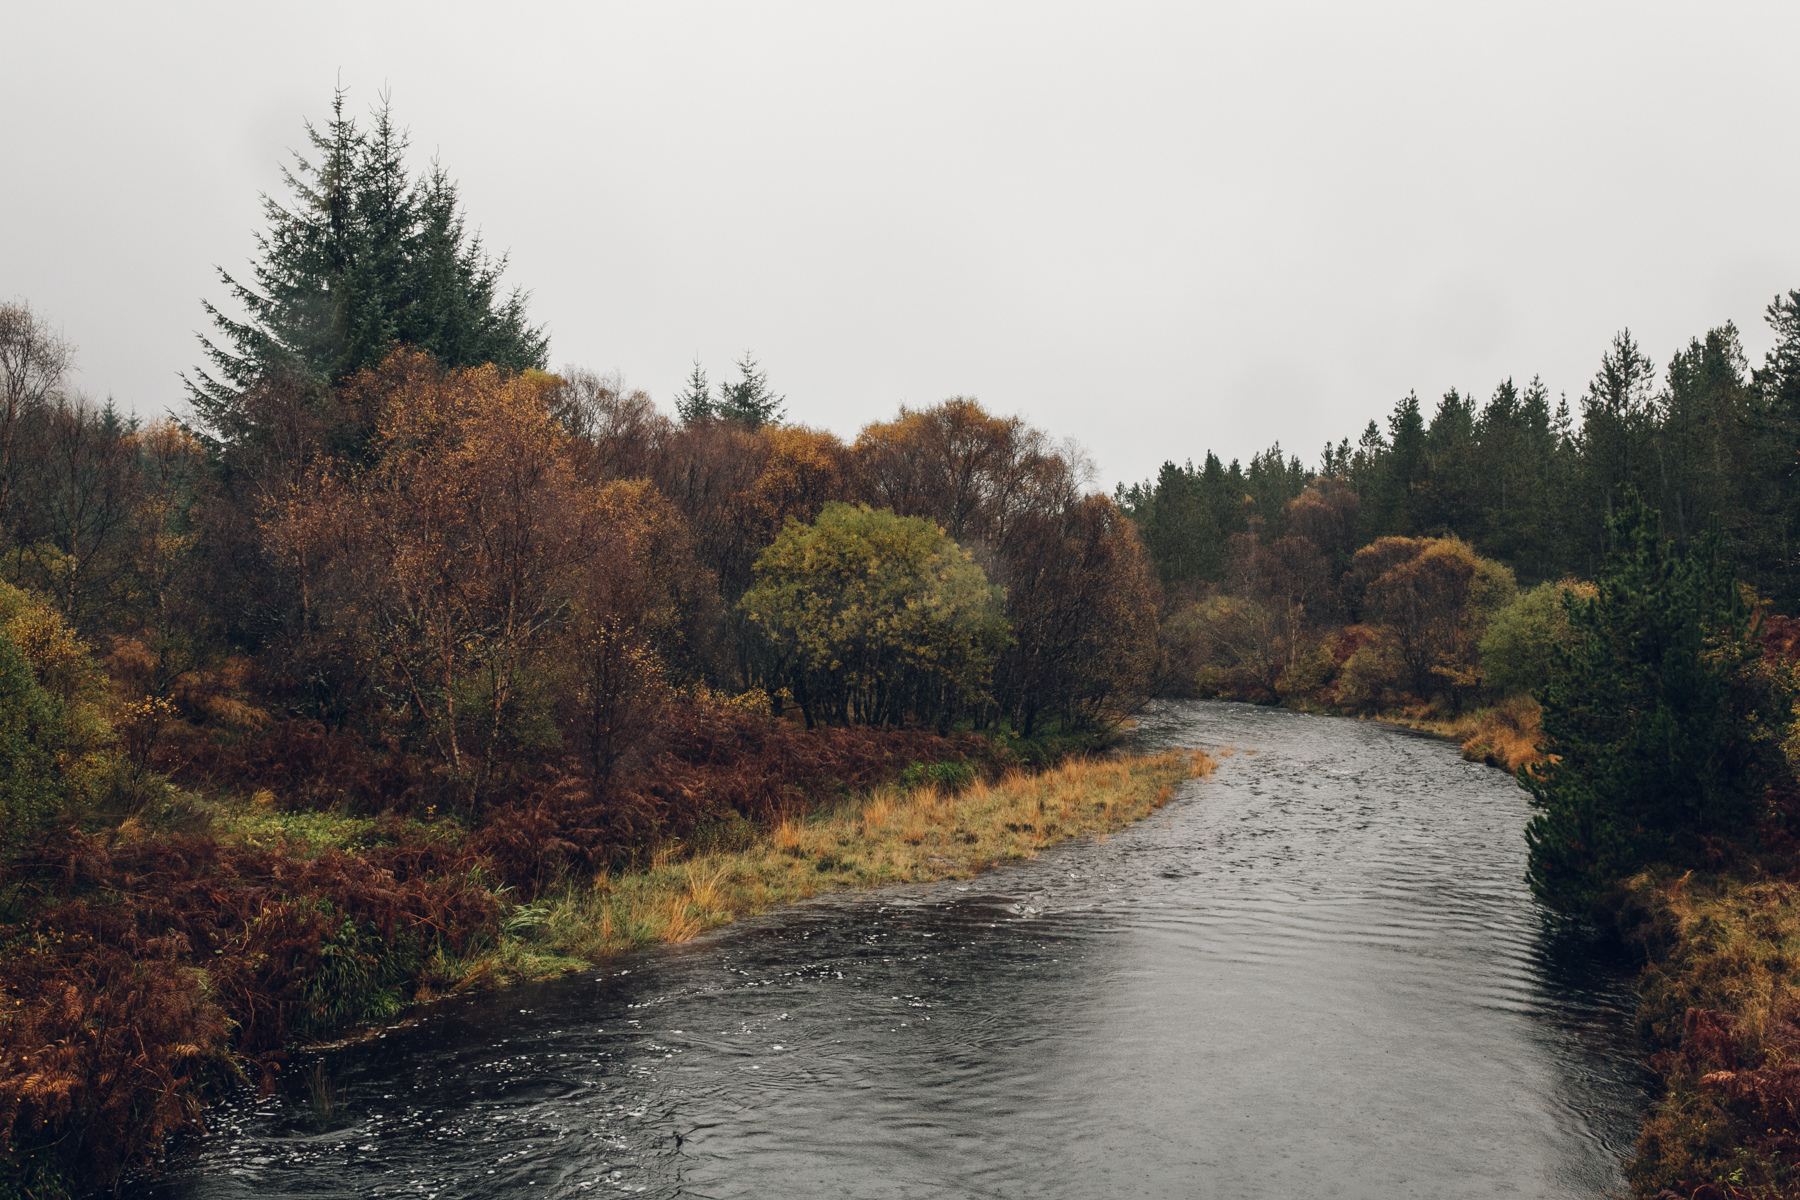 A colourful Autumn river scene.